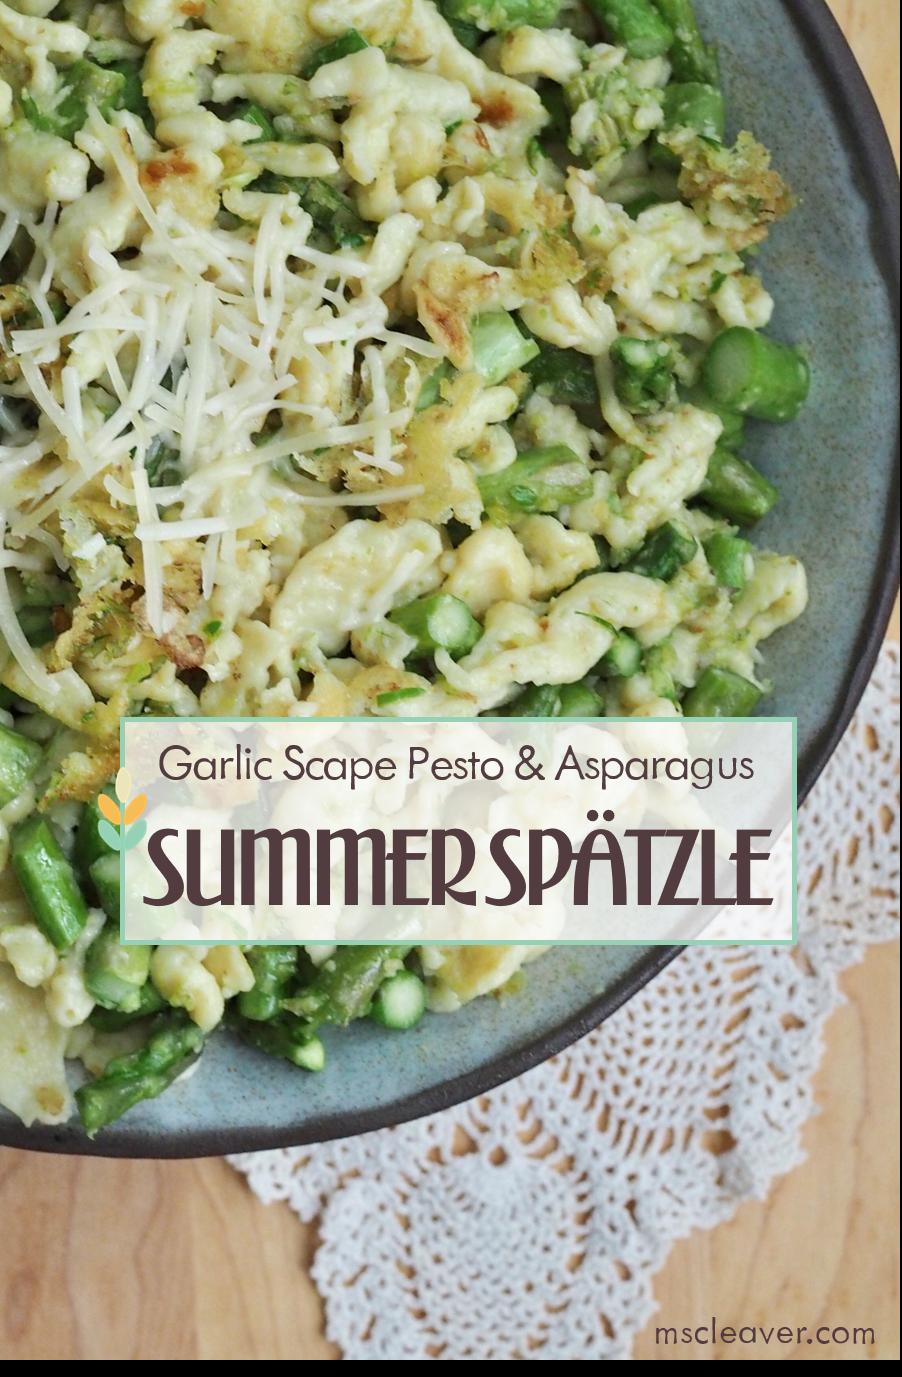 Summer Spaetzle Recipe.png